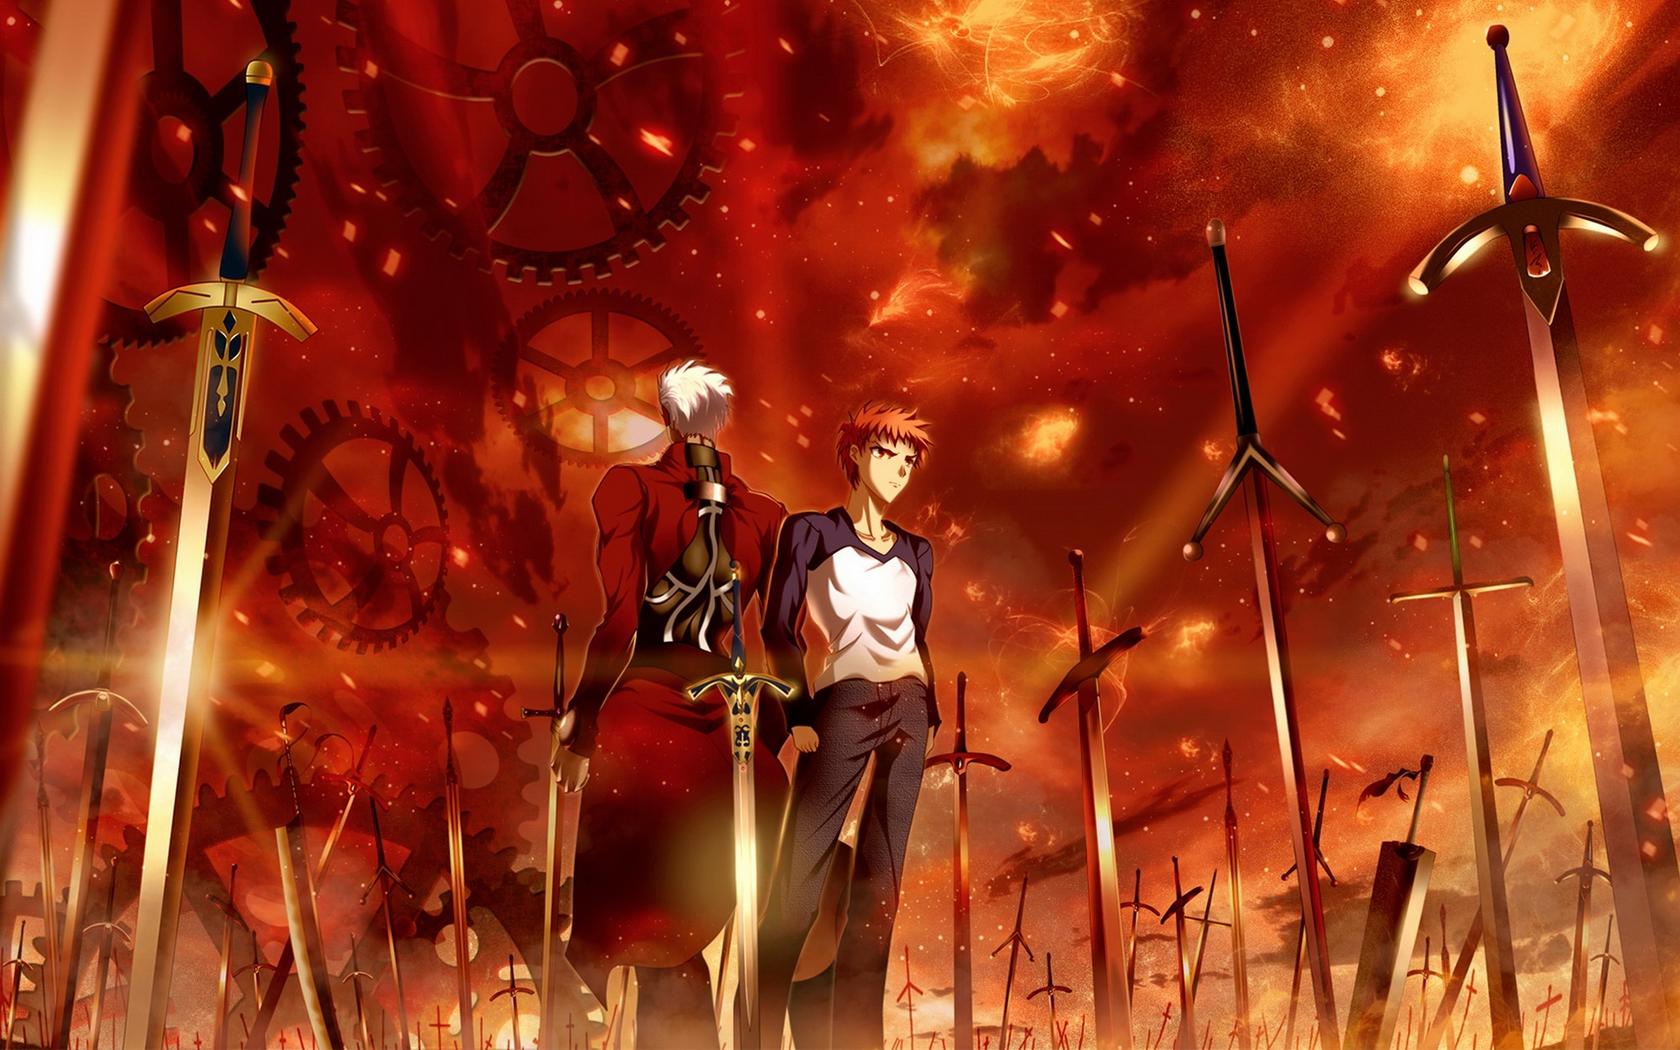 Unlimited Blade Works FateStay Night Archer Shirou Emiya Wallpaper 1680x1050